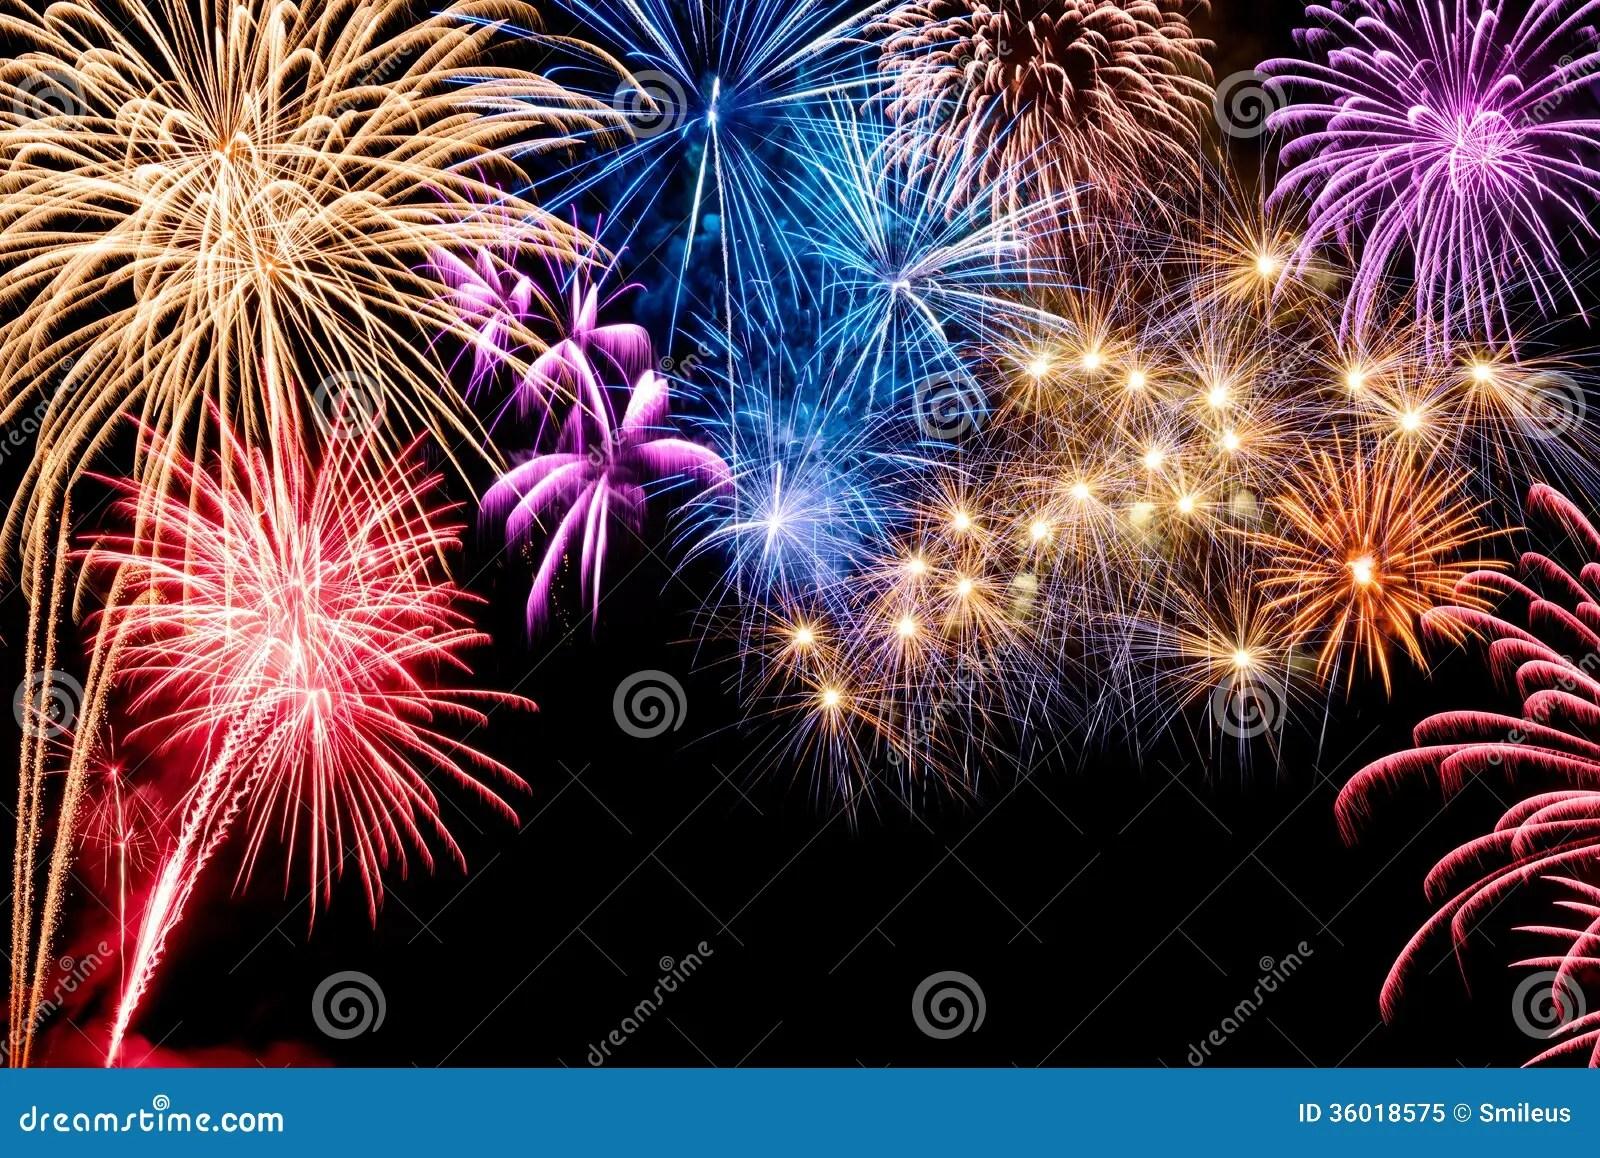 Gorgeous Fireworks Display Royalty Free Stock Photo